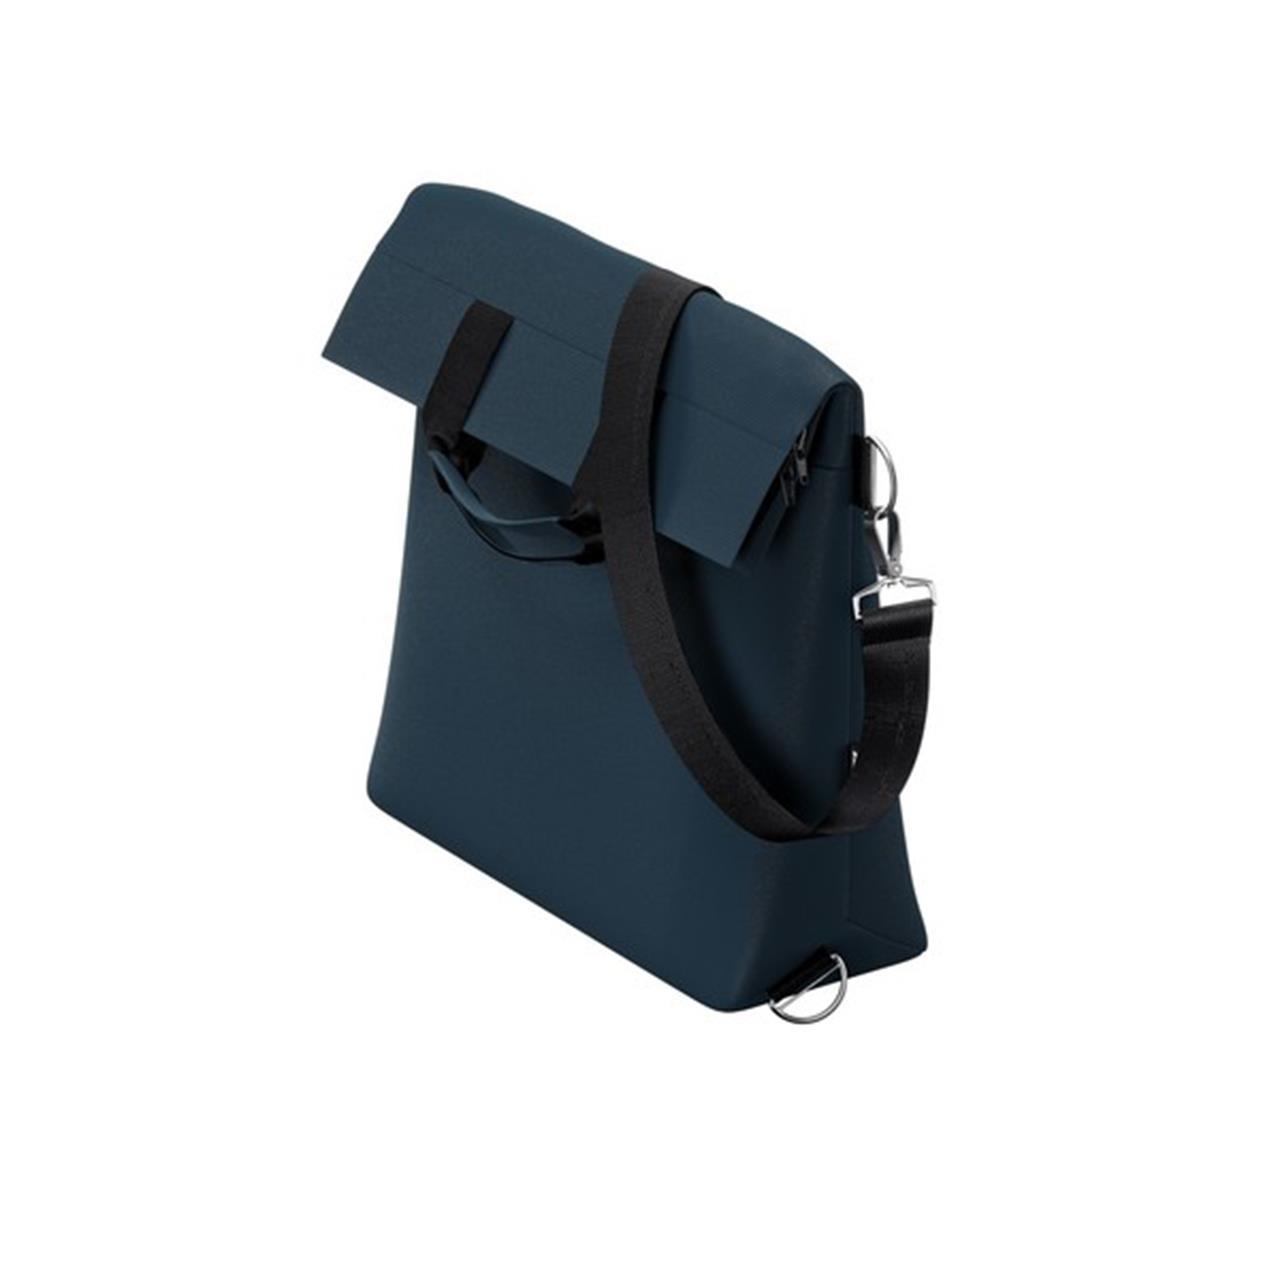 THULE 11000315 DIAPER BAG NAVY BLUE